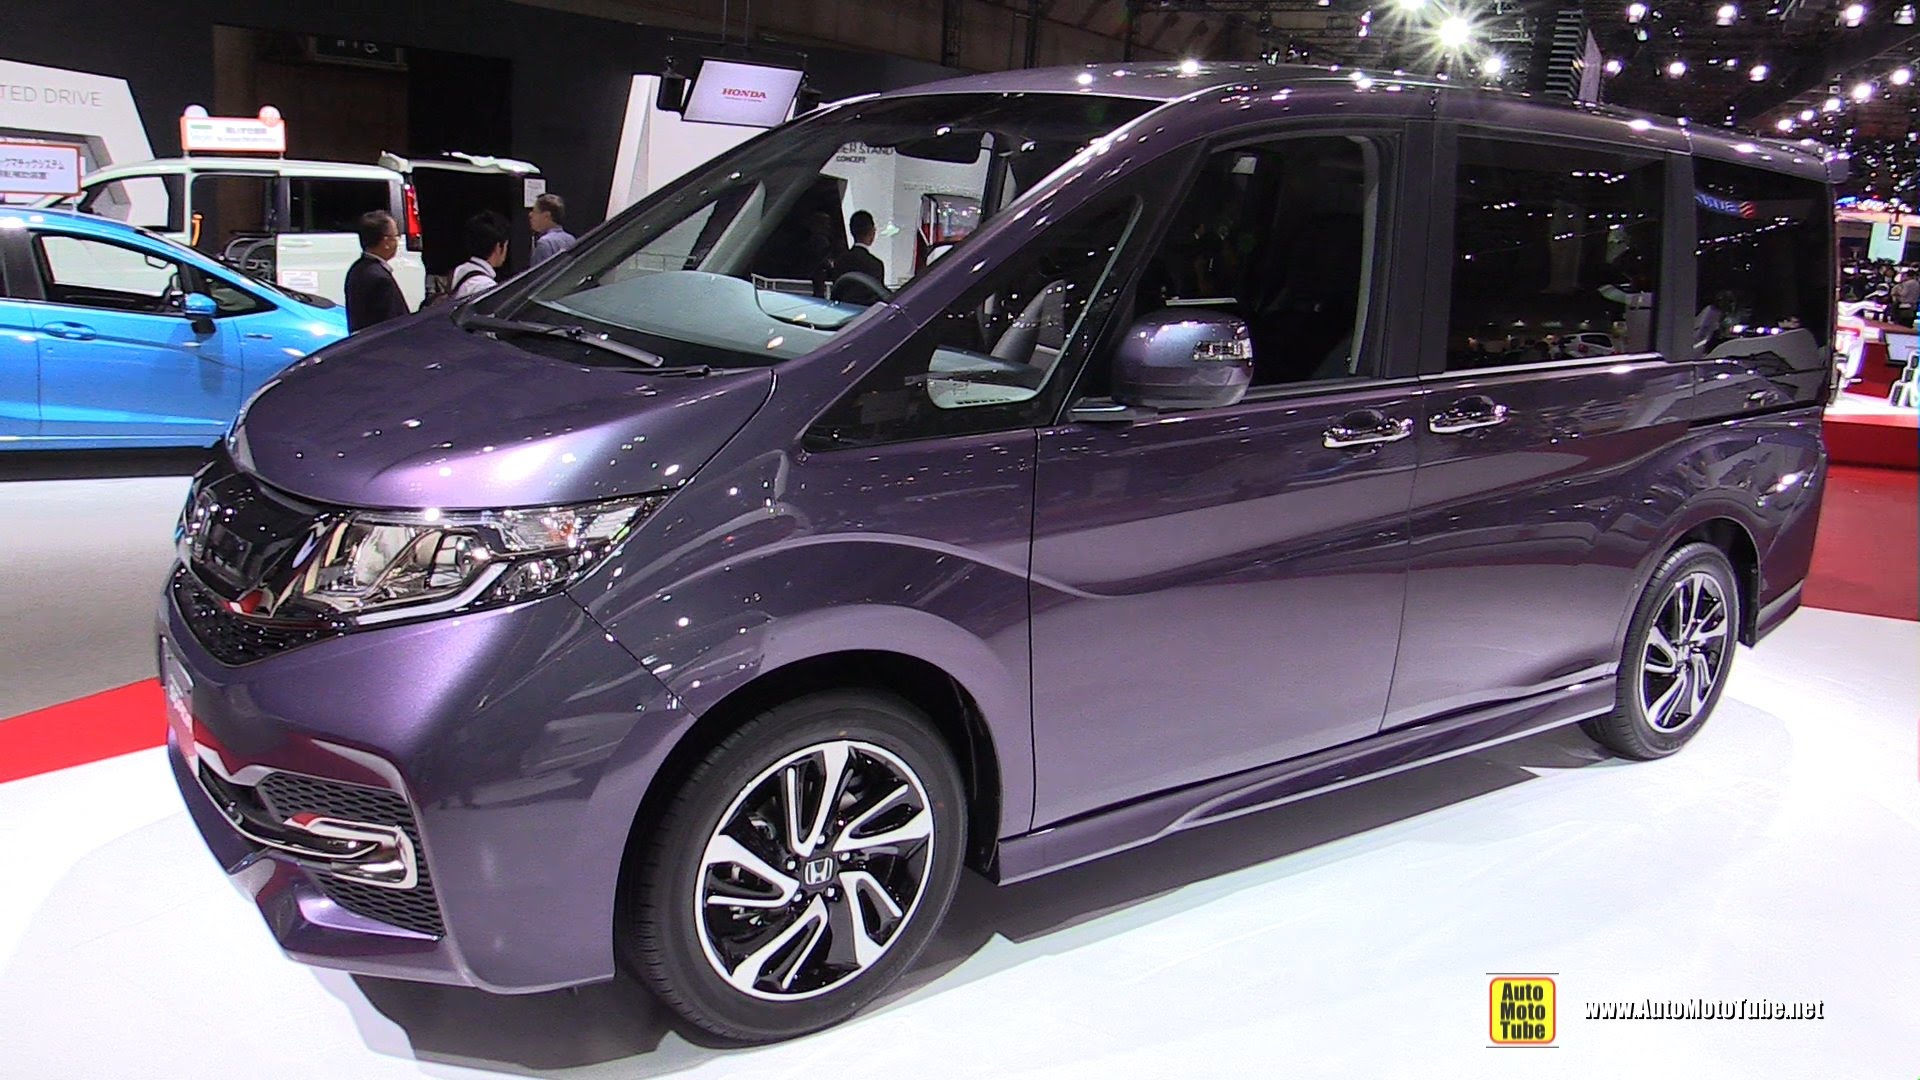 Honda Stepwgn V Restyling 2017 - now Minivan #8